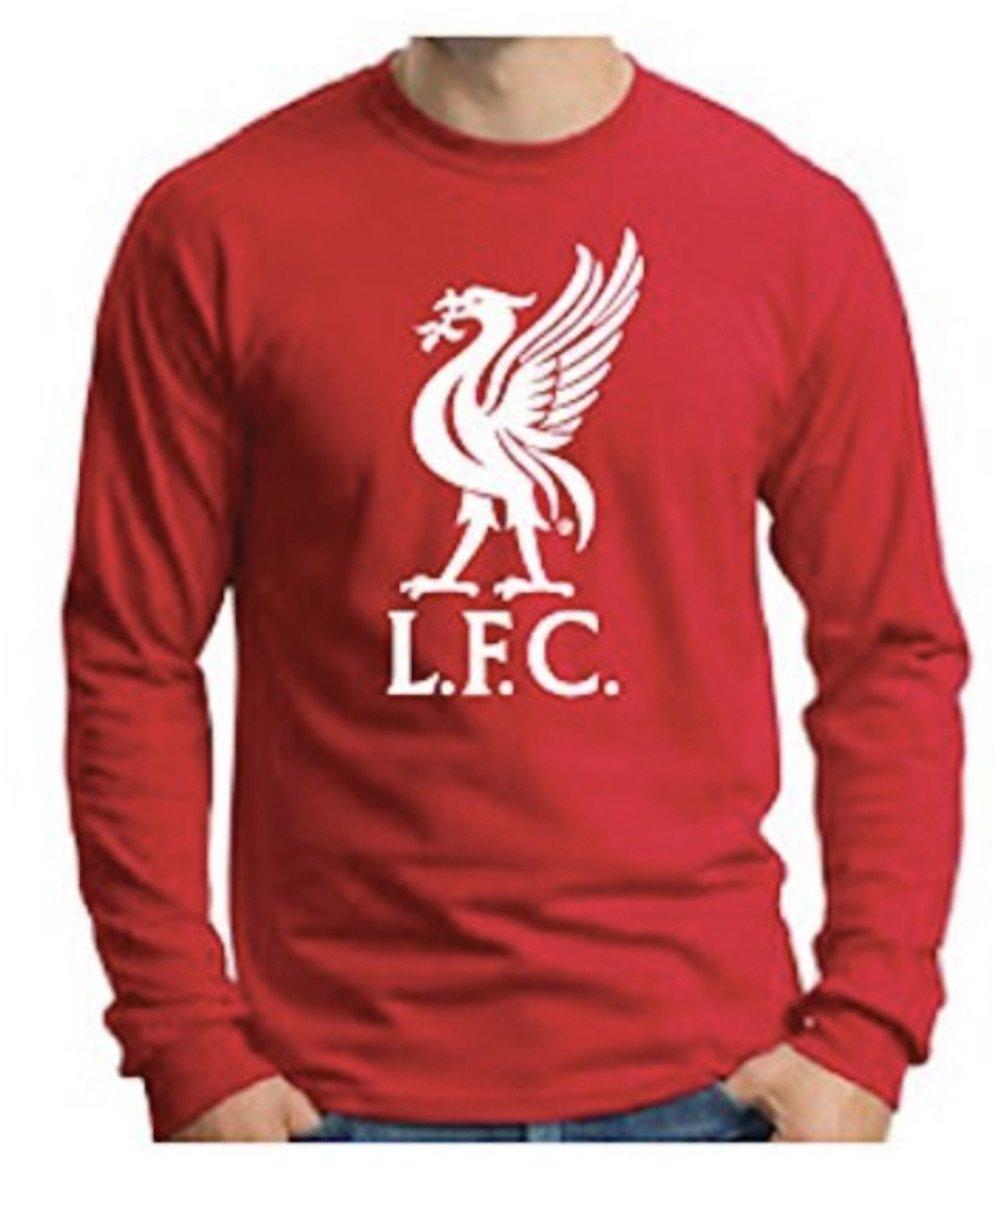 279ad8dec3d Amazon.com   Anfield Shop Liverpool FC Liverbird Red Long-Sleeve T-Shirt  (2XL)   Sports   Outdoors